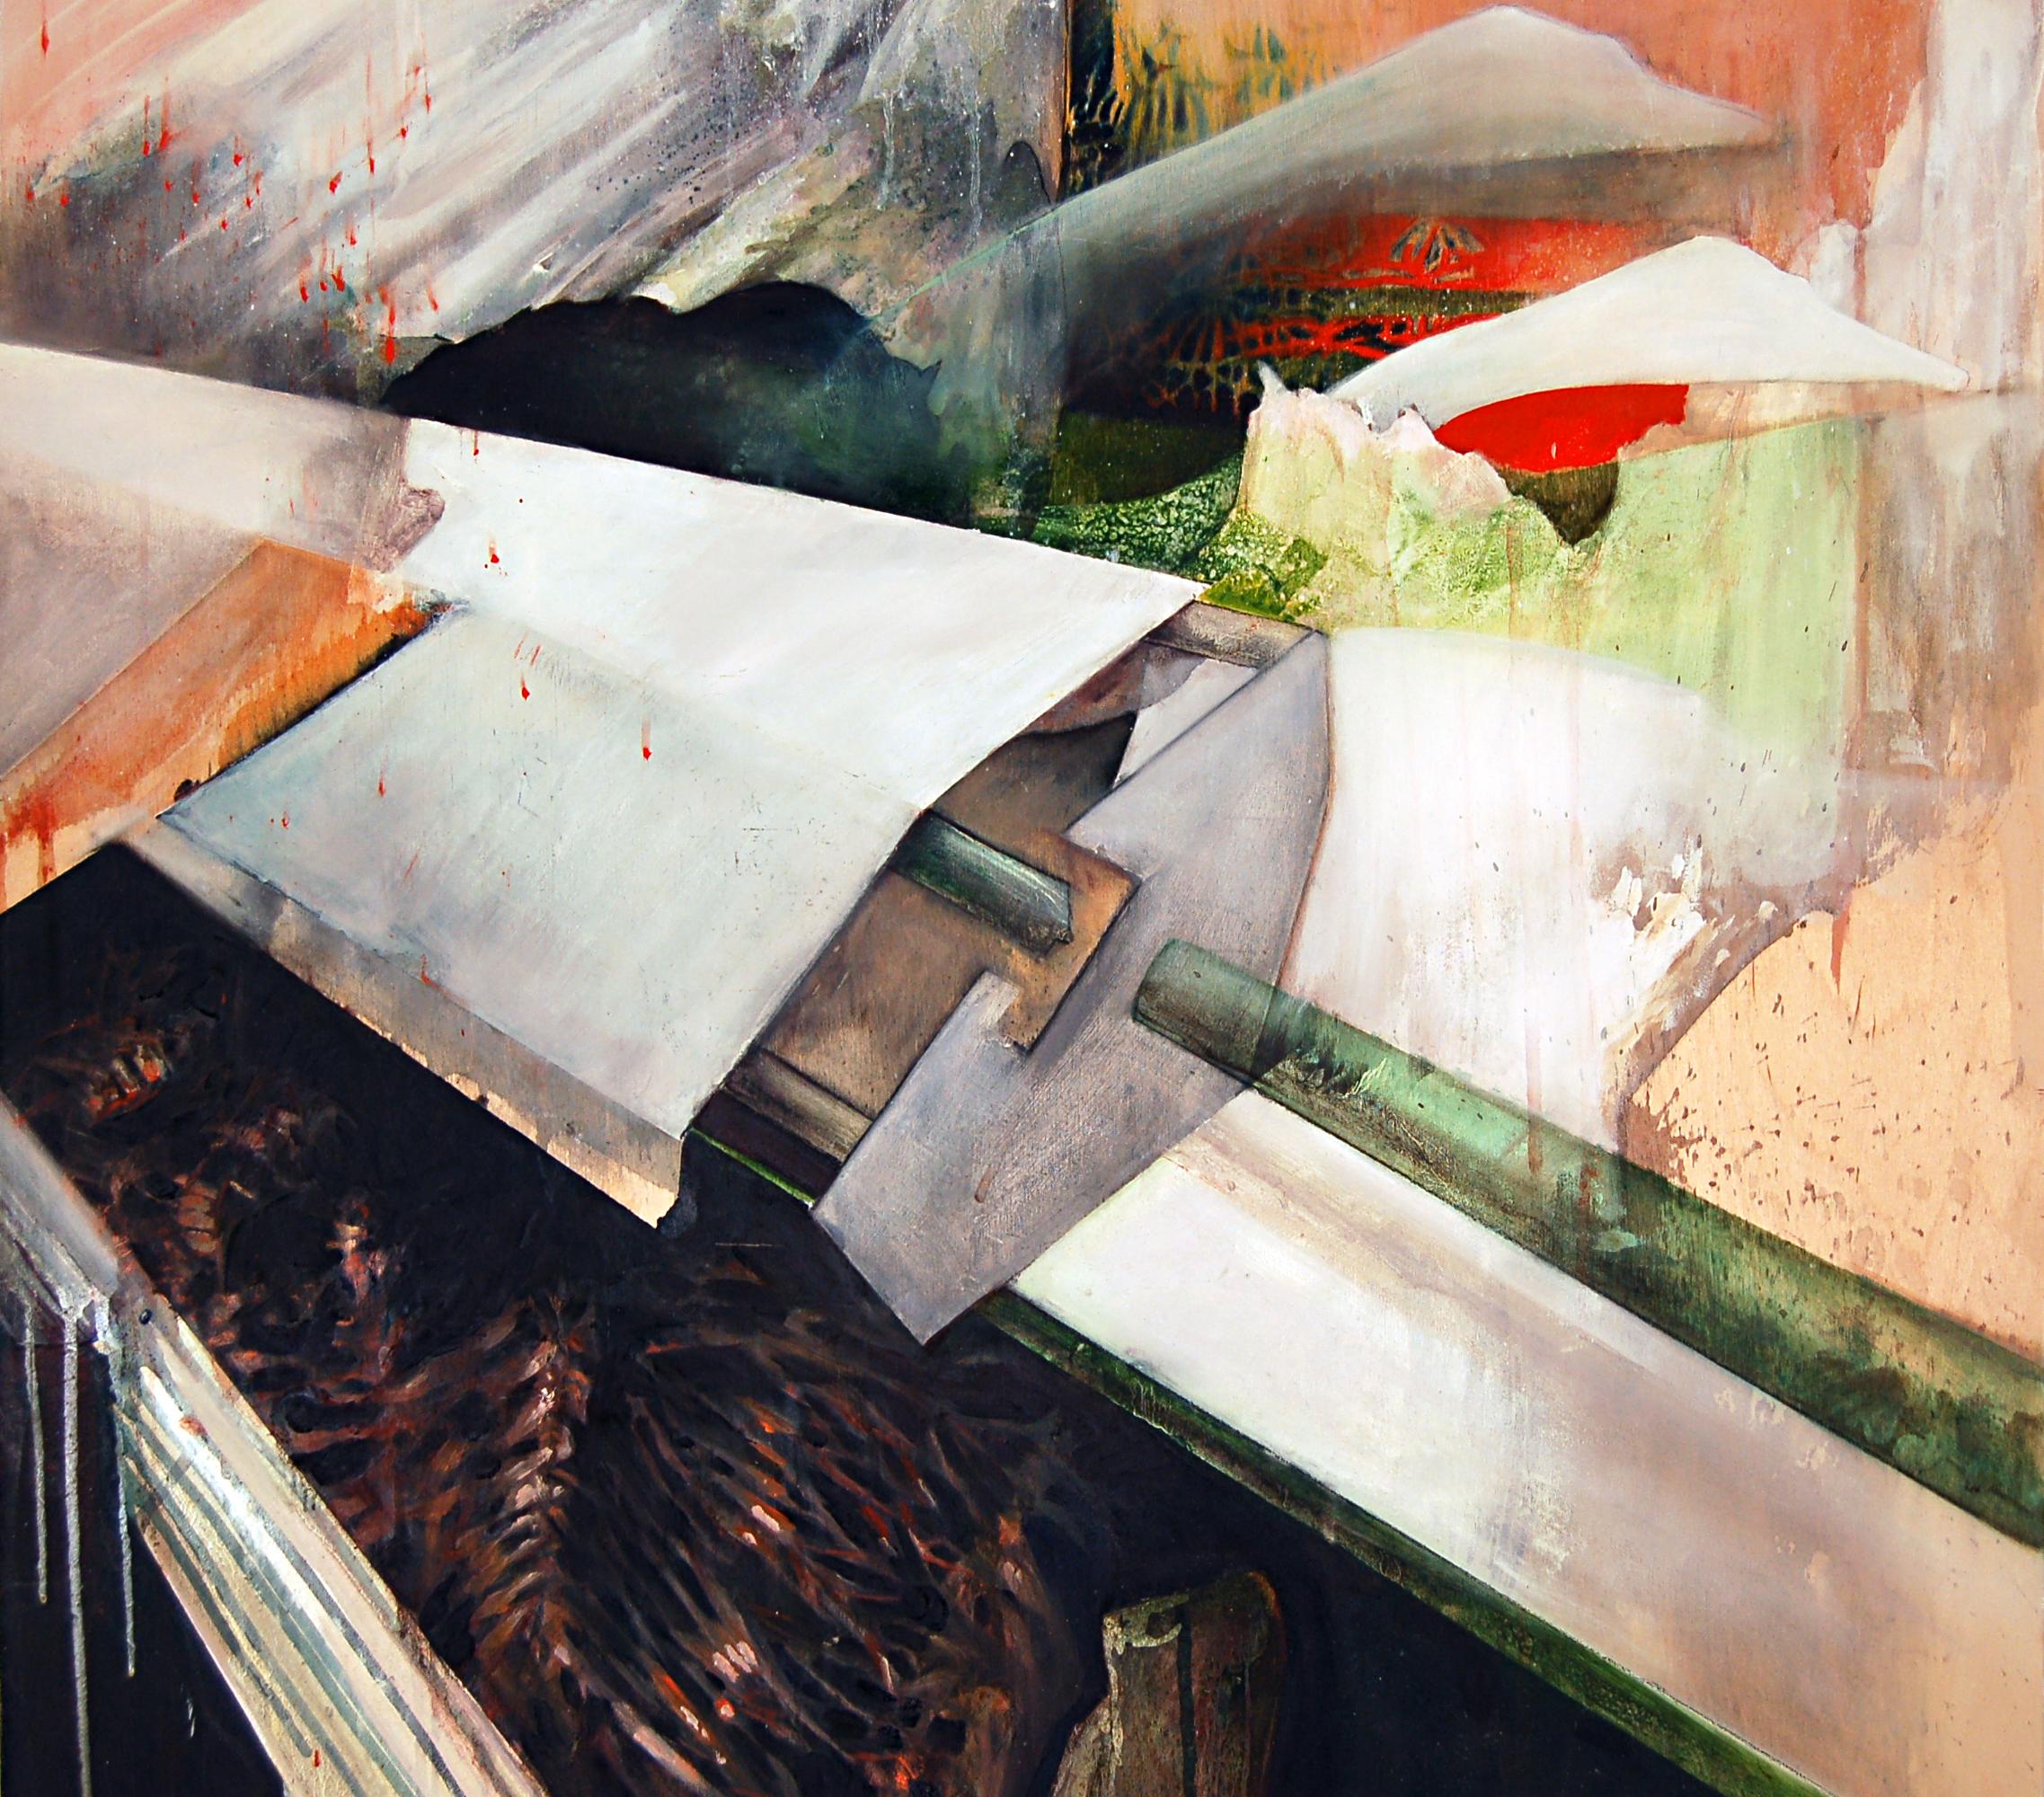 "Megan Krause,  Navigating Hindemith , Watercolour, Acrylic and Oil on Panel, 24"" x 24"", 2012"